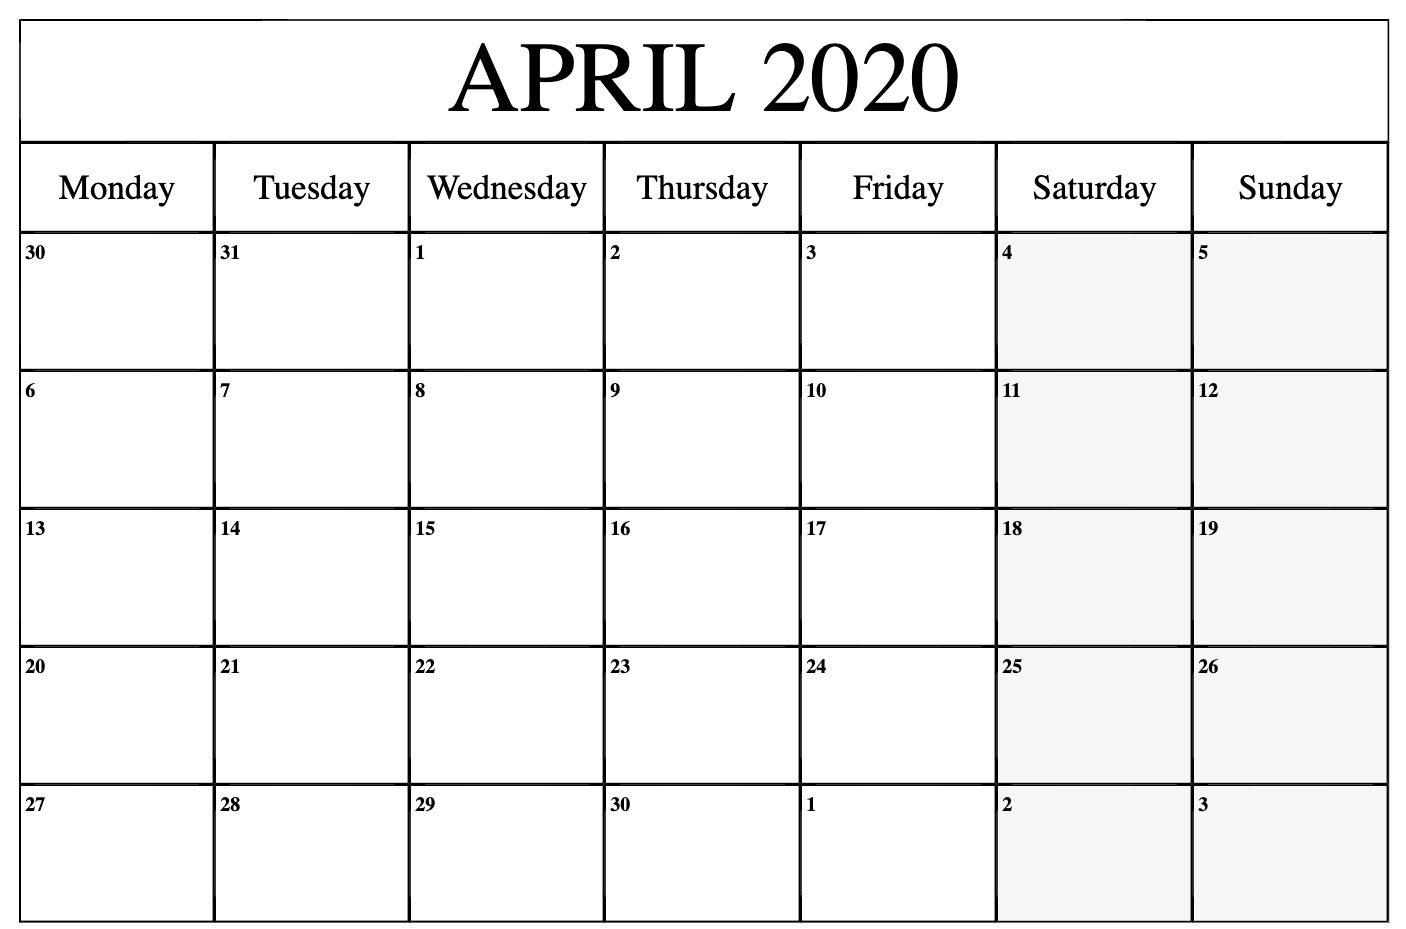 April Printable Calendar 2020.Free April Calendar 2020 Free Printable Template Pdf Word Excel